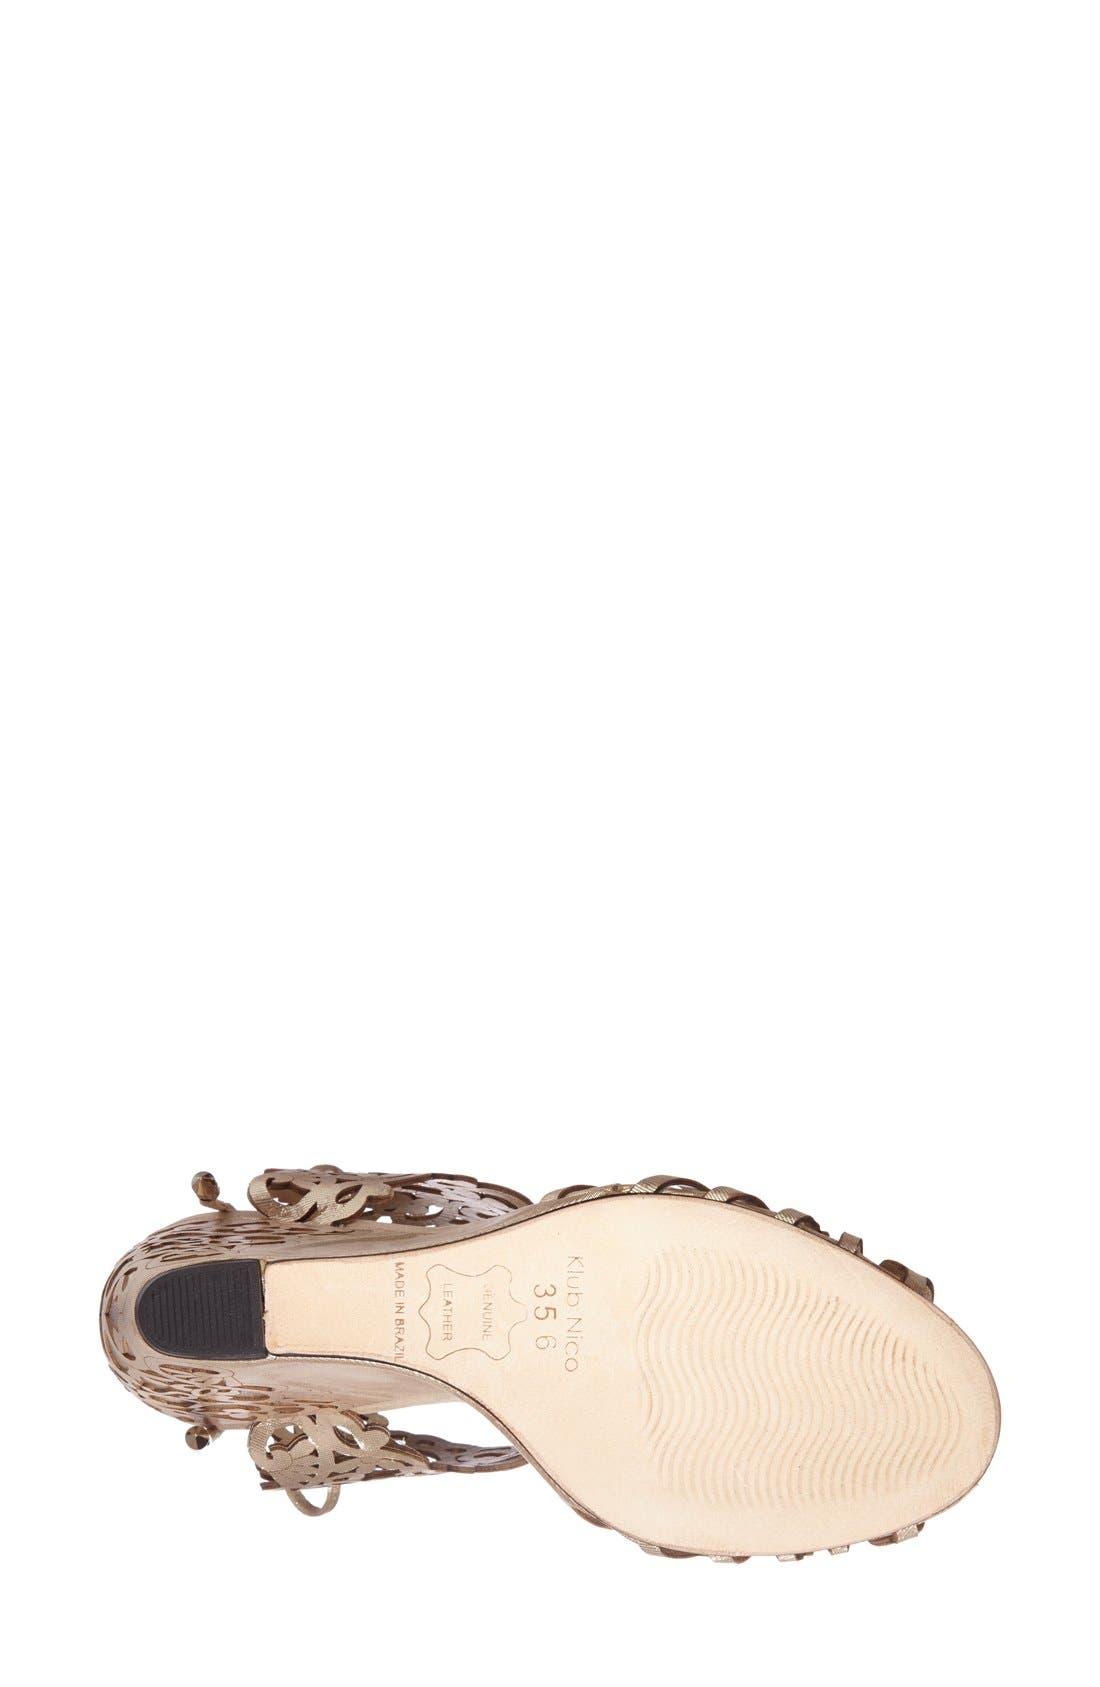 'Moxie' Laser Cutout Wedge Sandal,                             Alternate thumbnail 4, color,                             CHAMPAGNE GLOSS